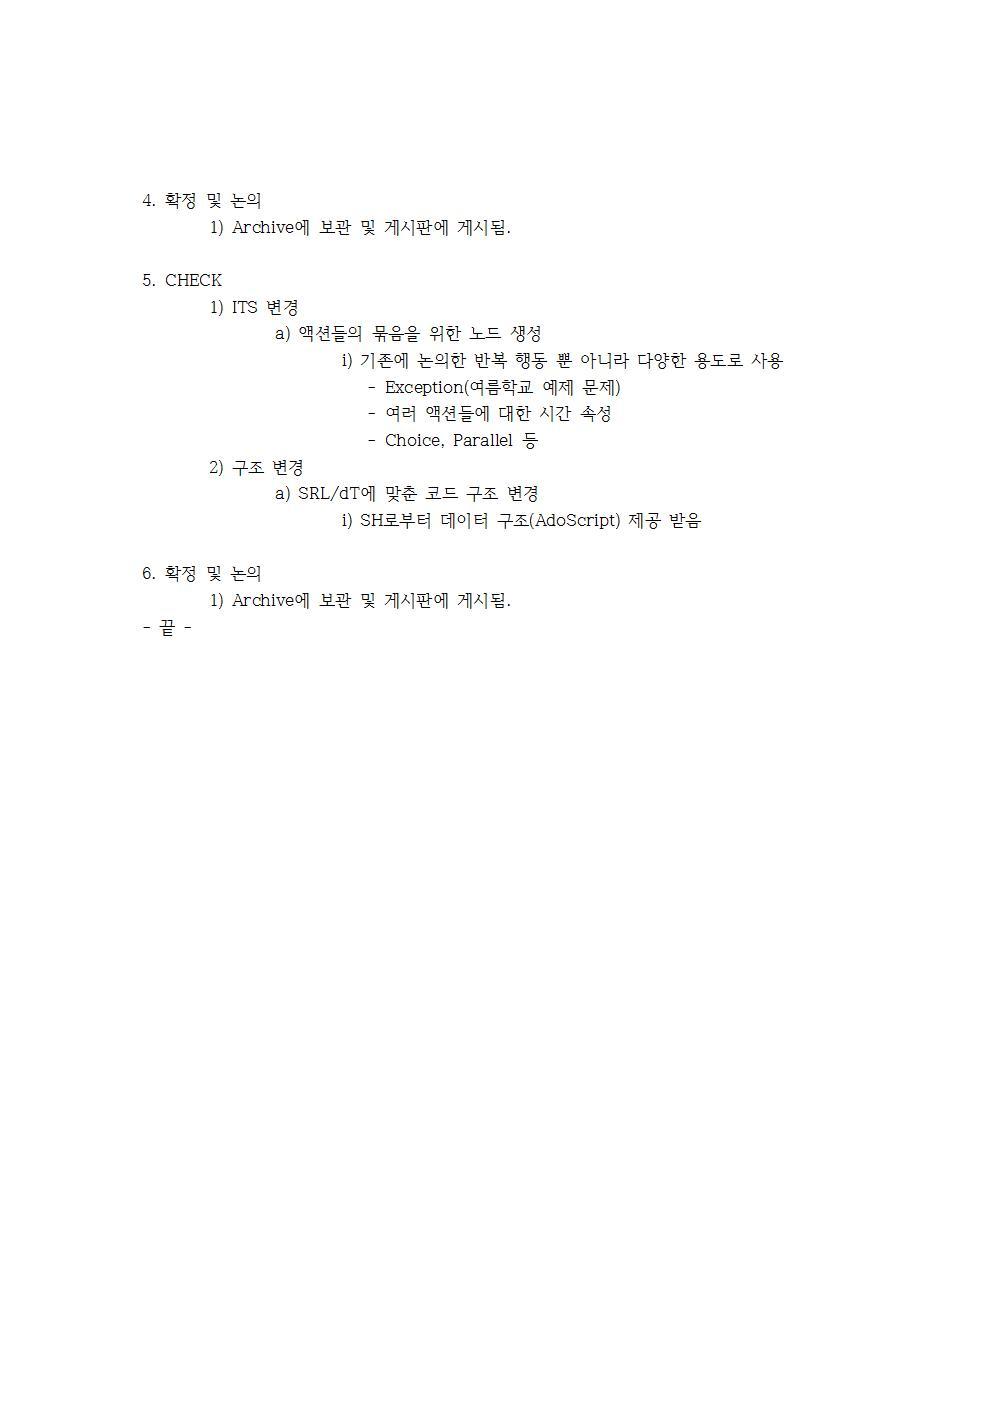 D-[17-005-RD-01]-[SAVE 2.0 ADOxx]-[YB]-[2017-11-11]002.jpg